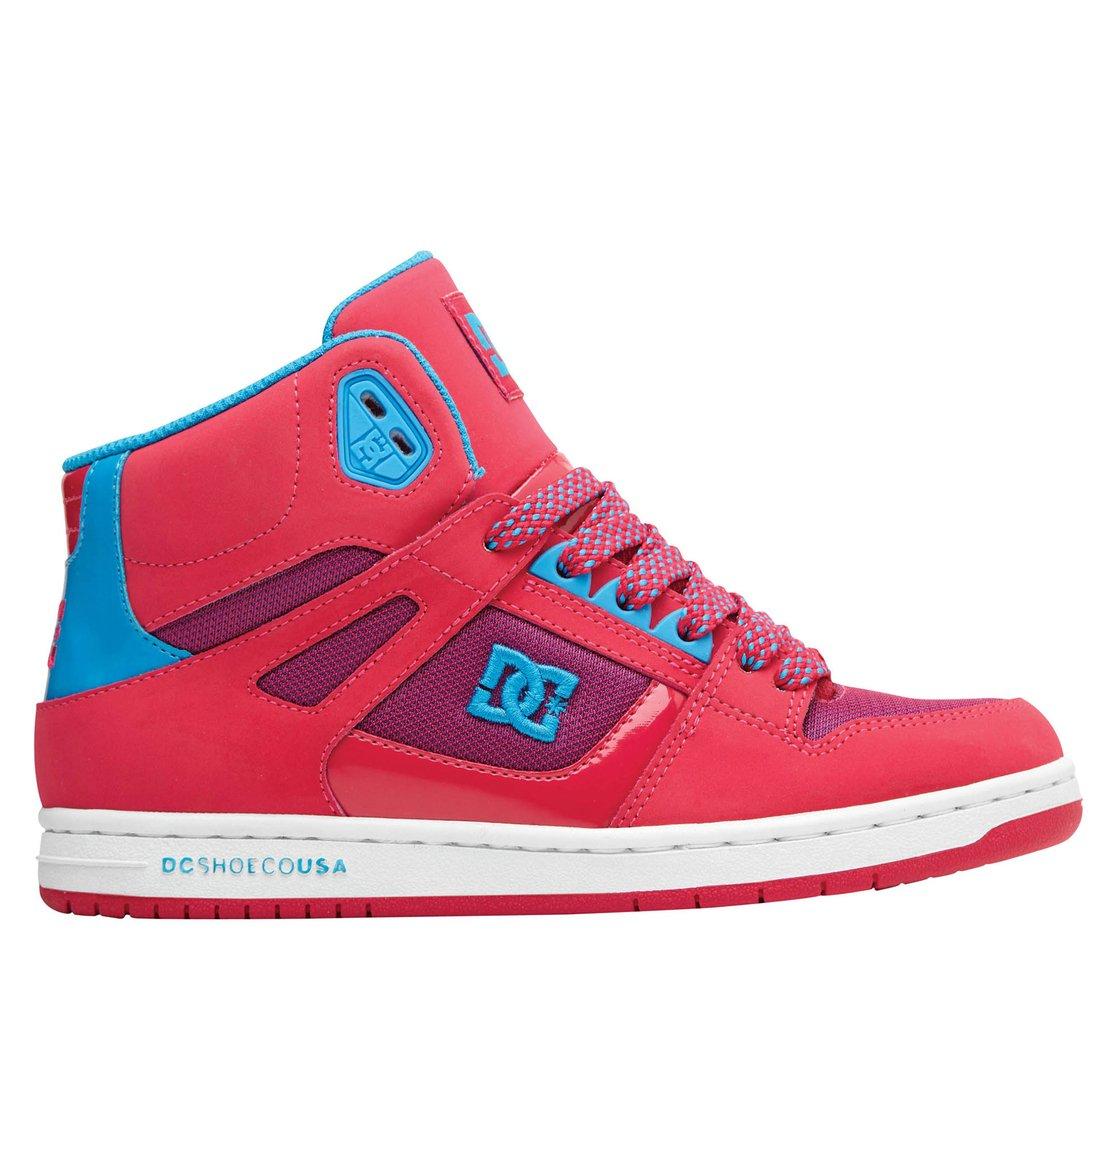 f363226a1ce7 0 Women s Rebound High Shoes 302164 DC Shoes